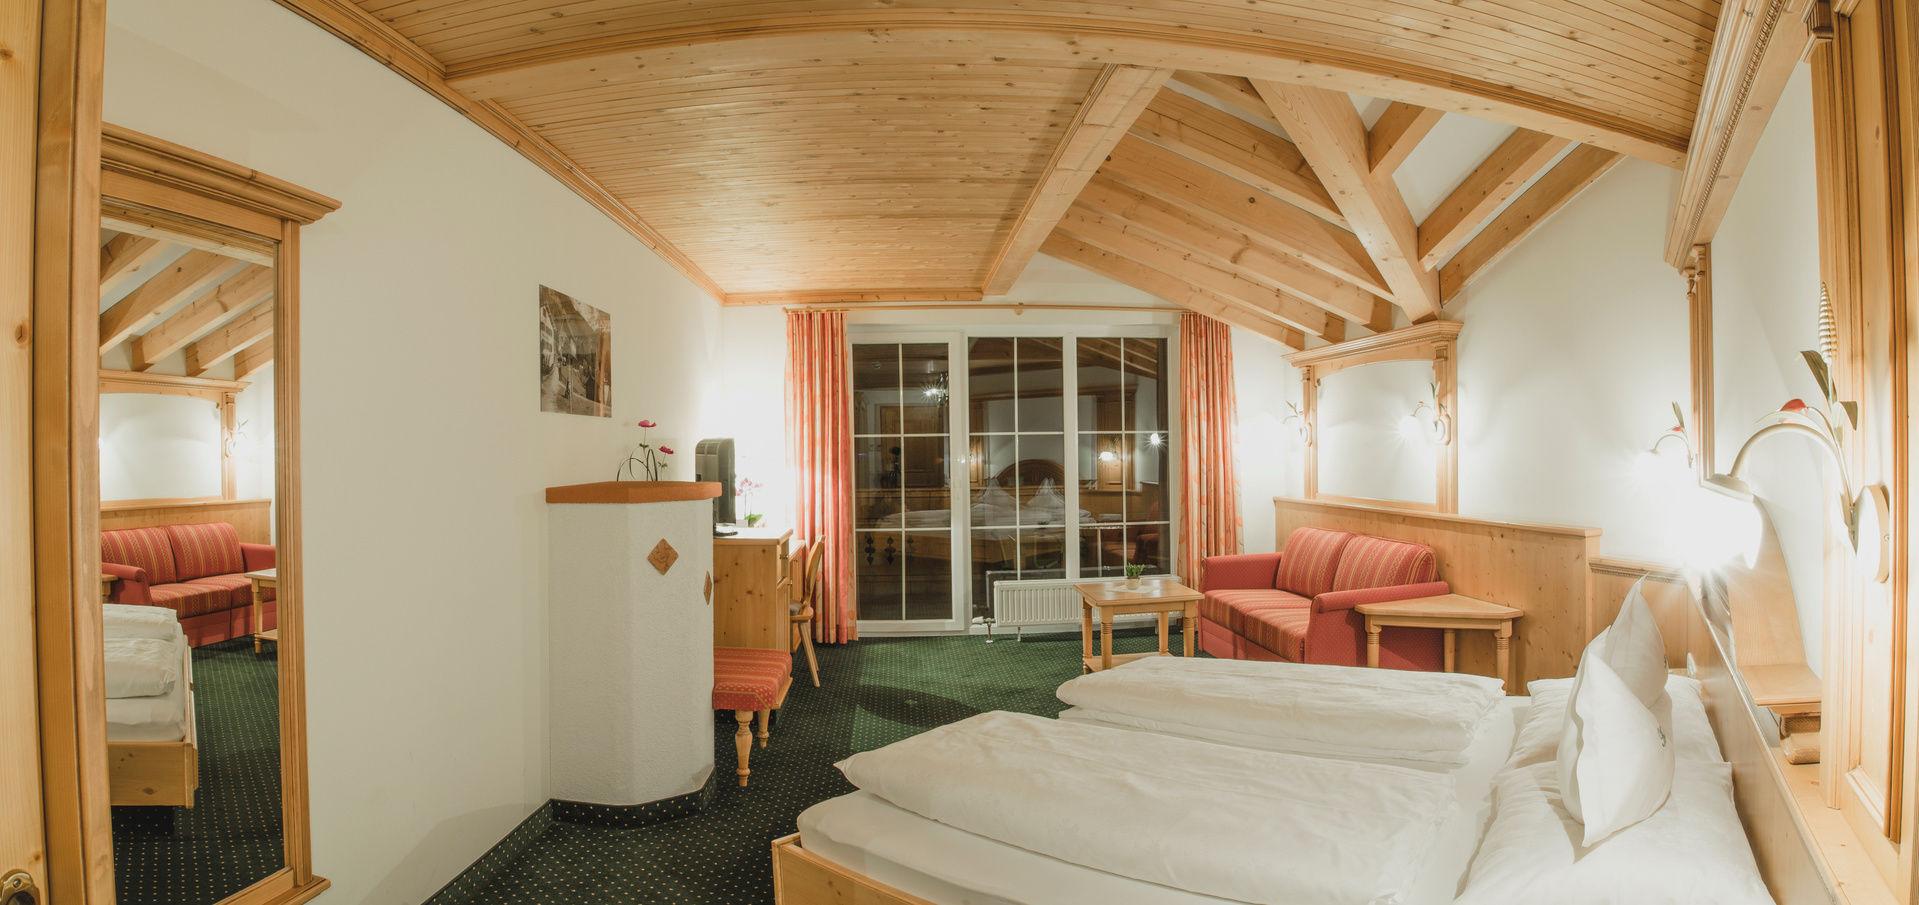 Hotels im montafon book jufa hotel montafon for Designhotel skifahren